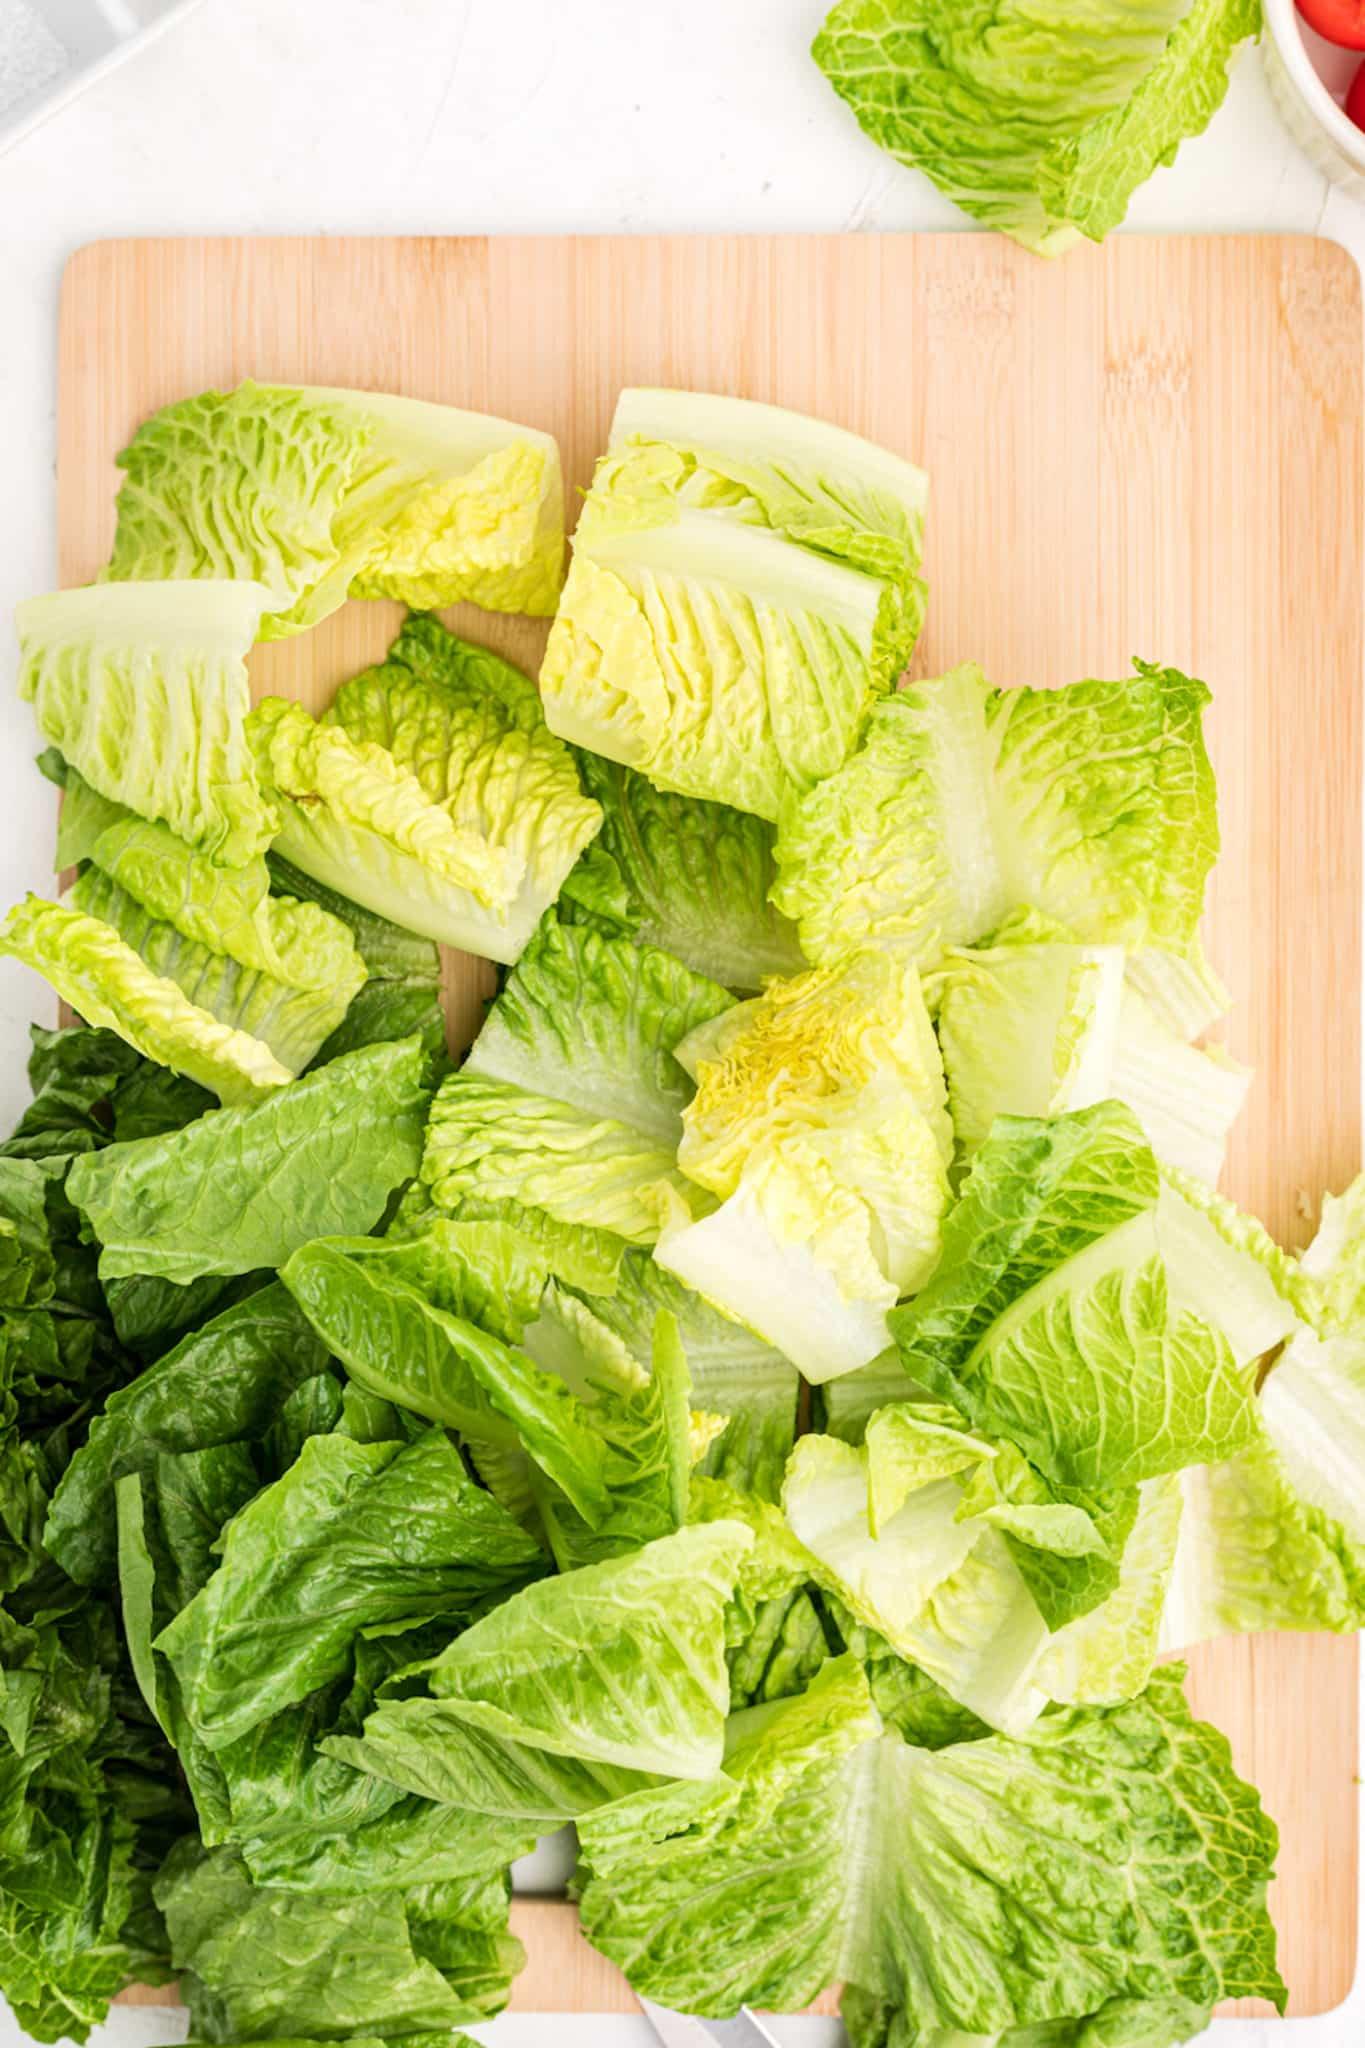 chopped romaine lettuce on a cutting board